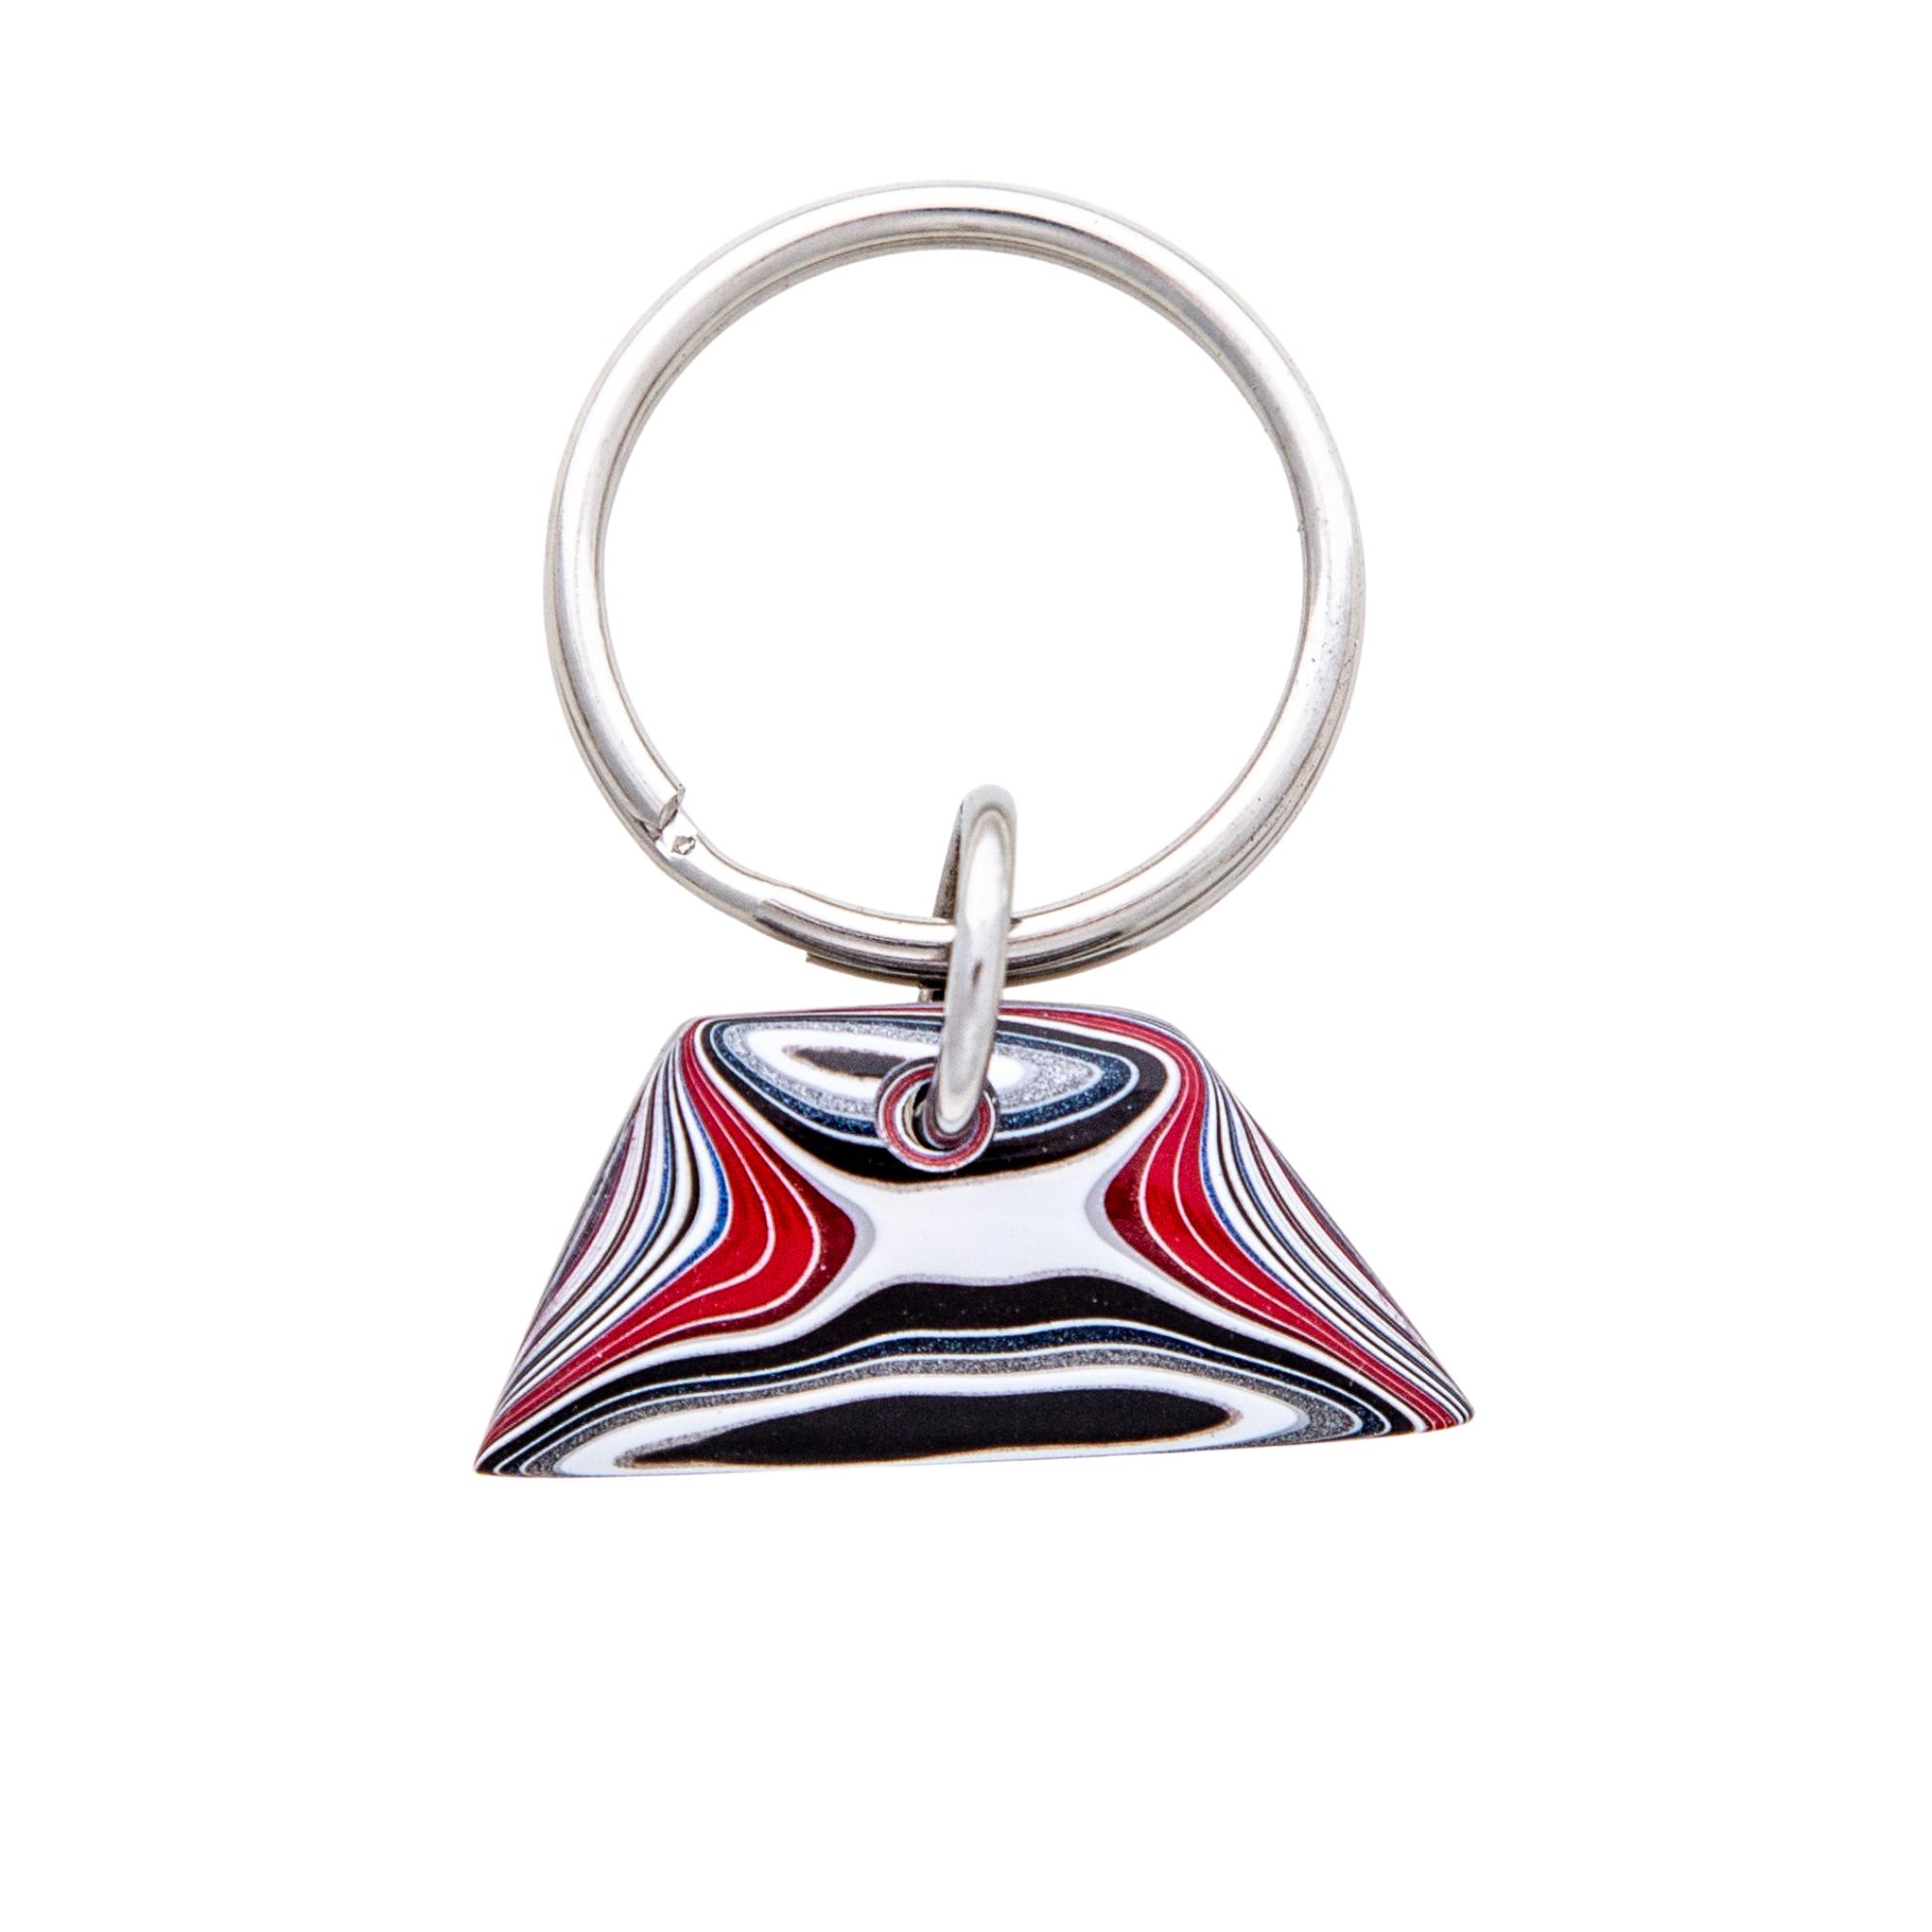 Siesta Silver Jewelry Fordite Key Chain Detroit Agate Automotive Gift